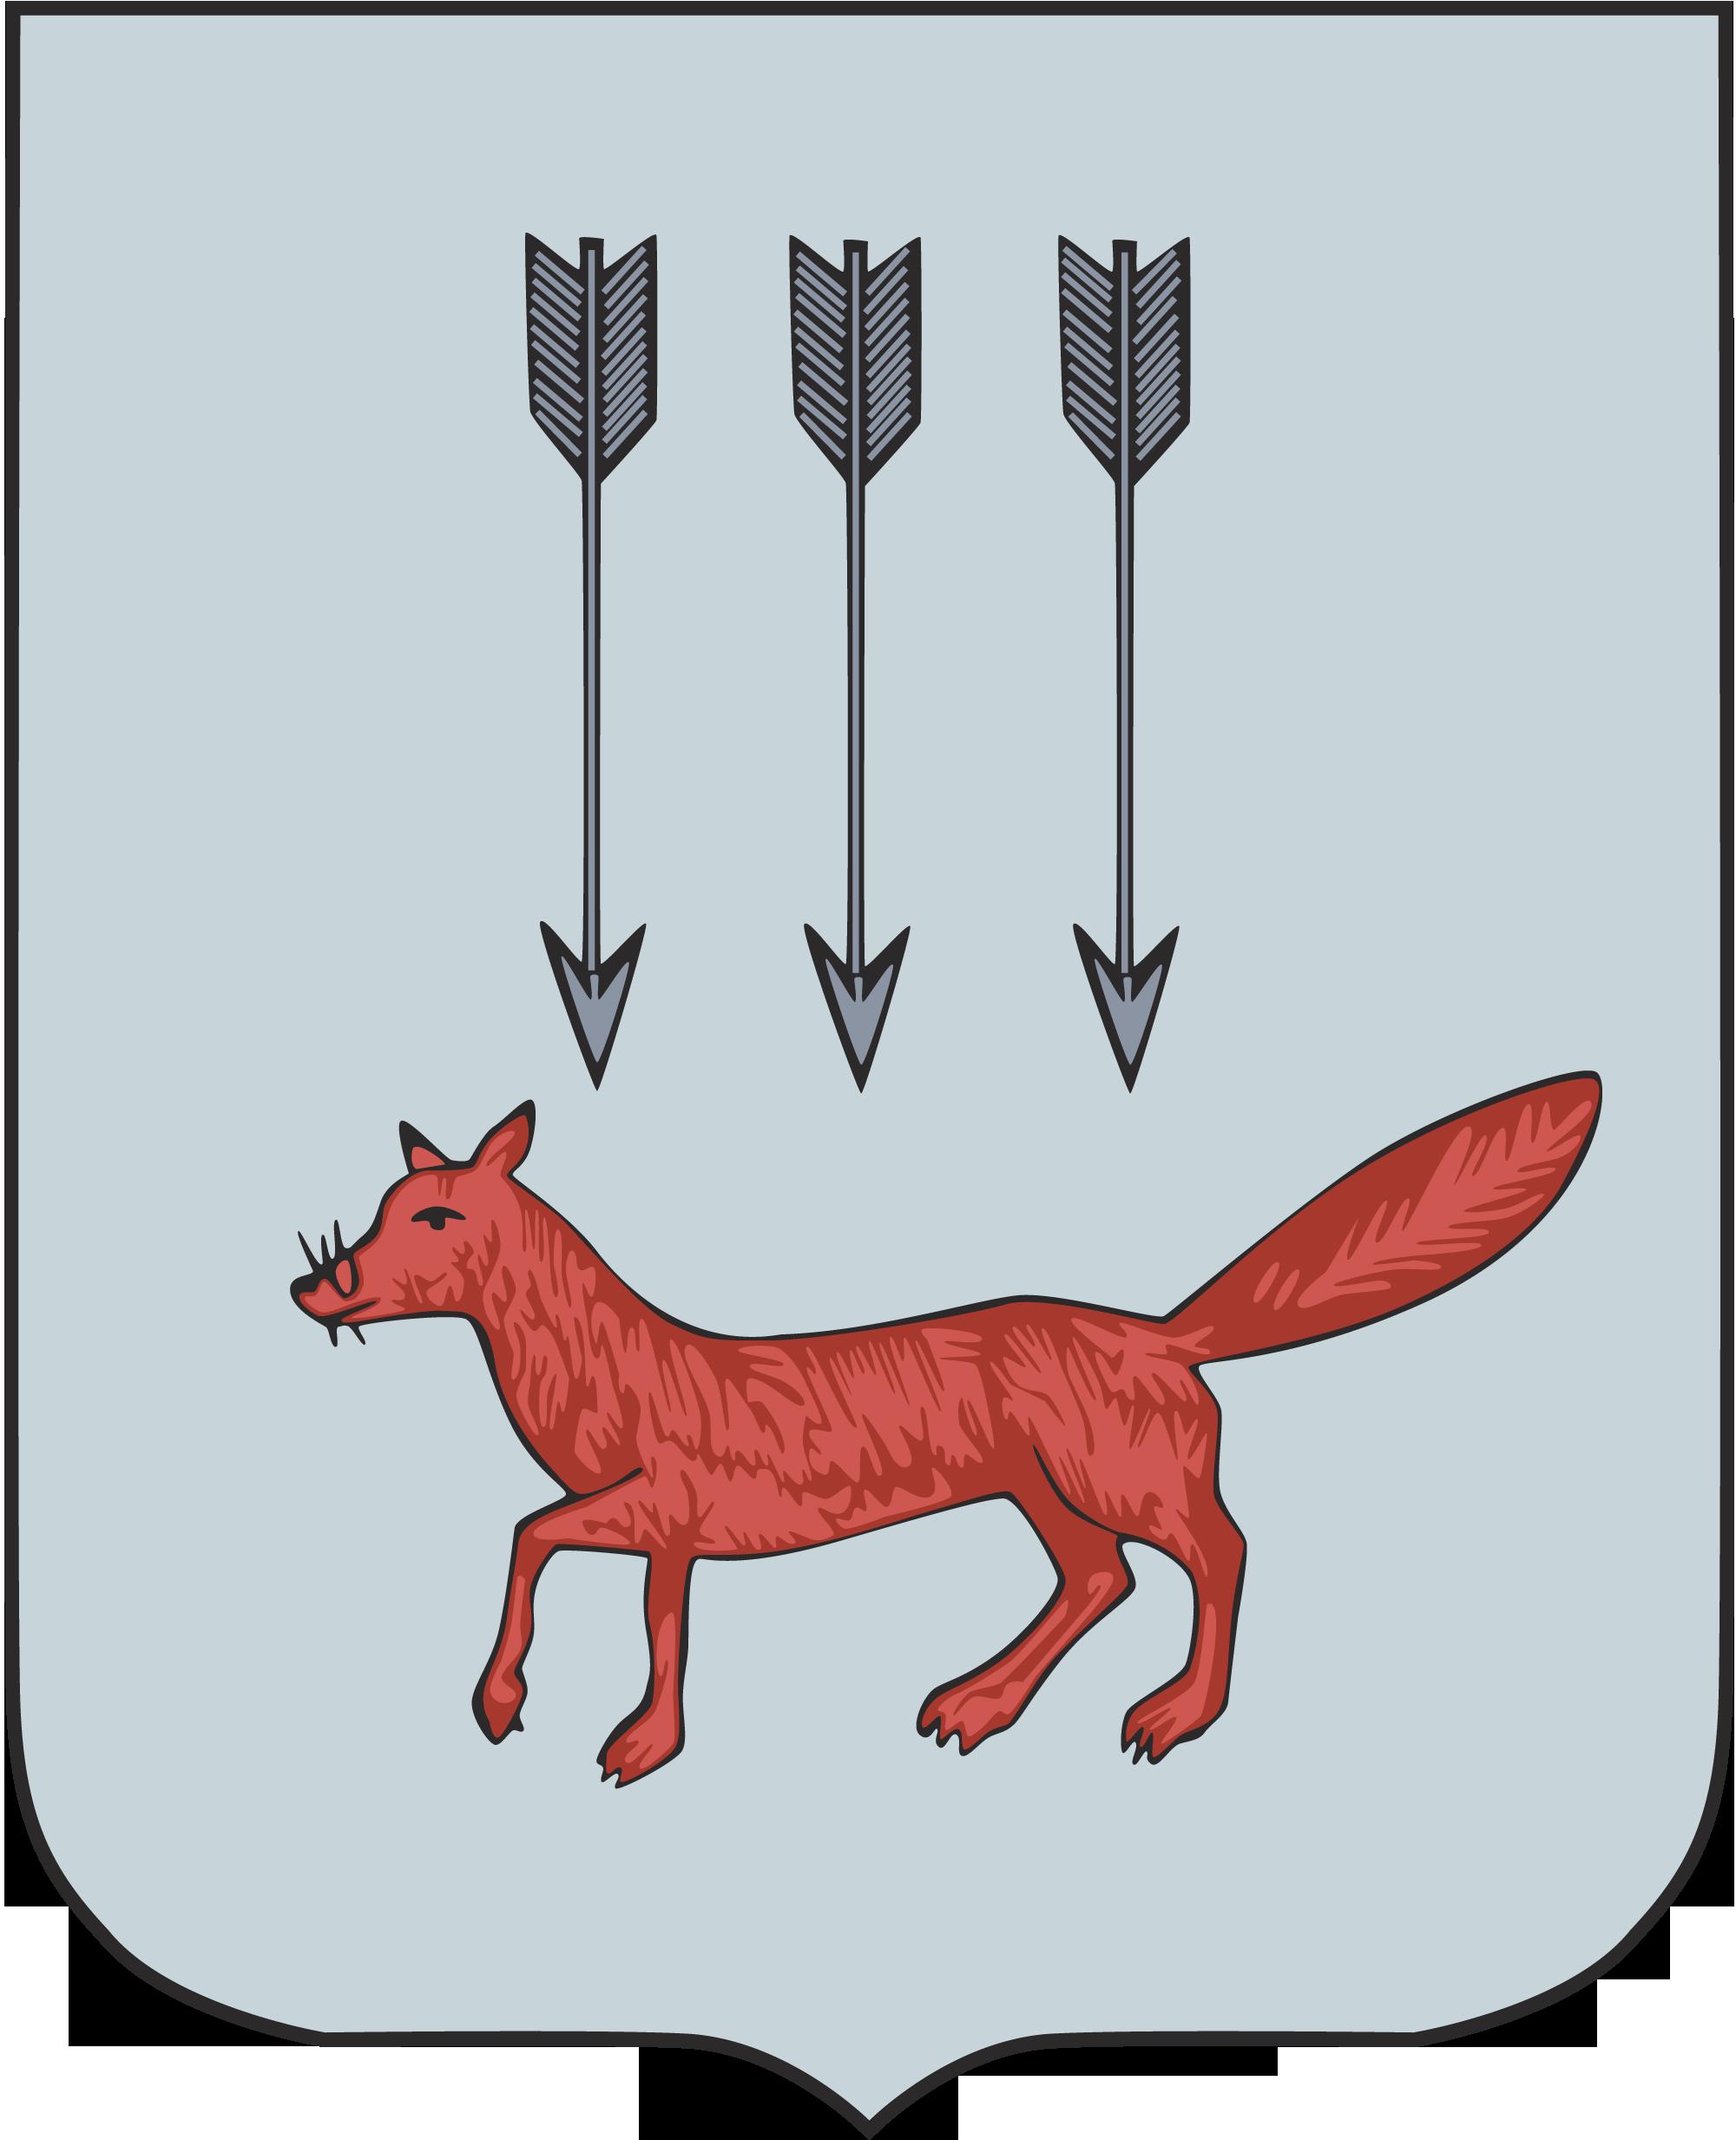 герб Саранска 1781 года